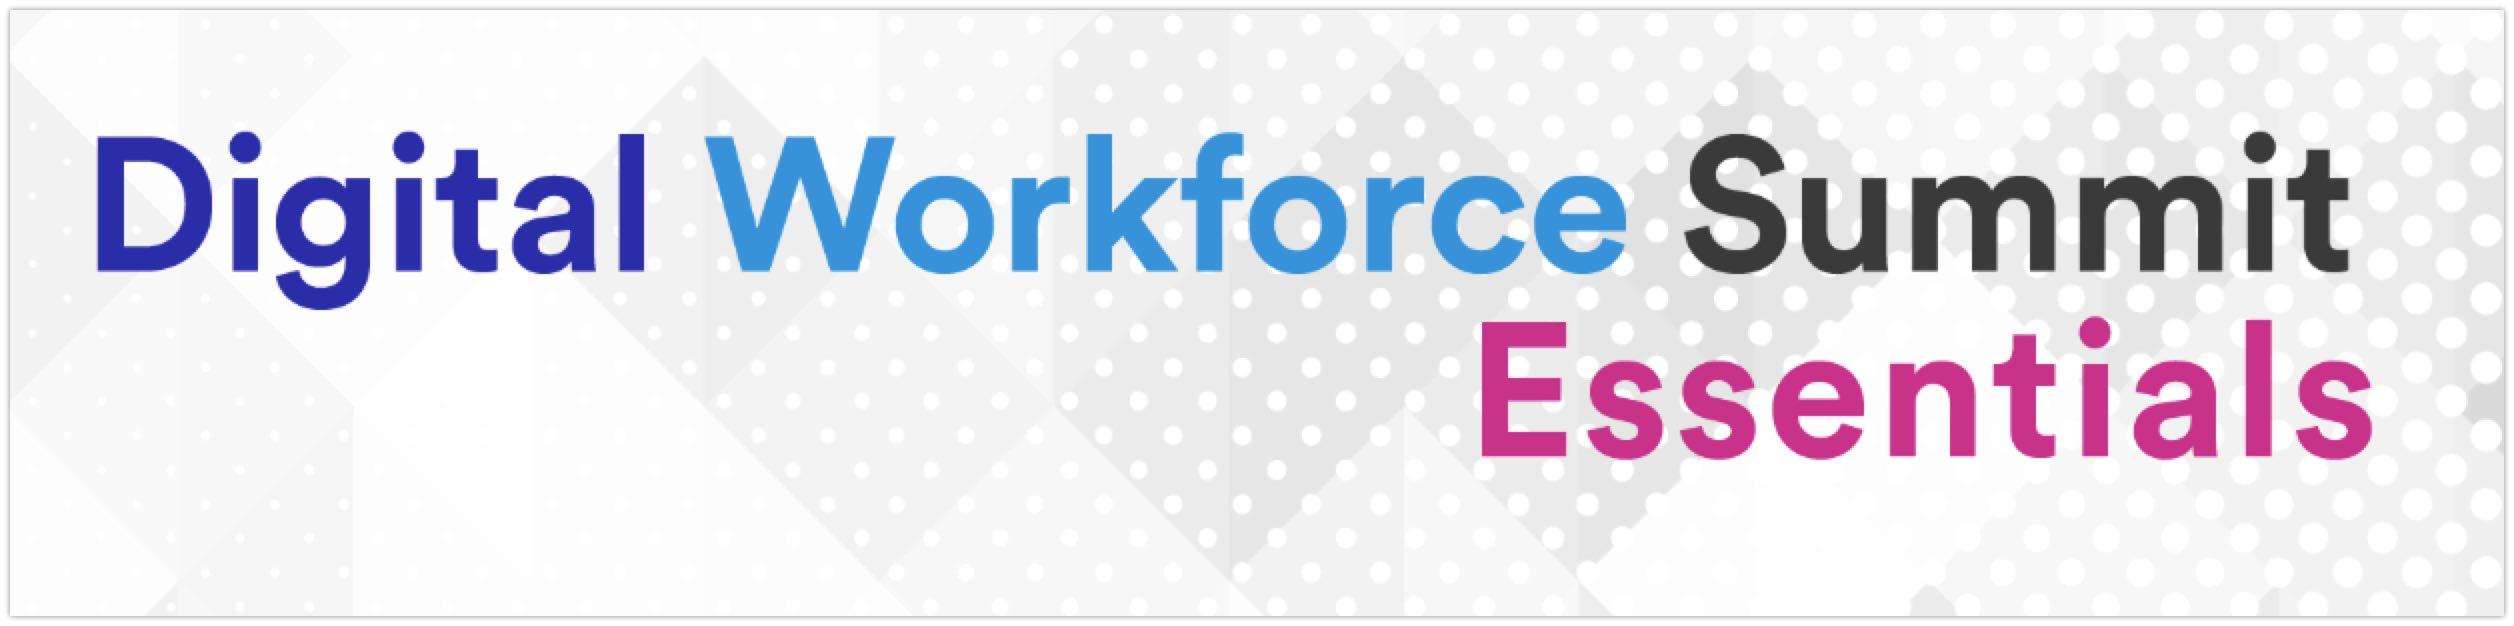 Digital Workforce Summit